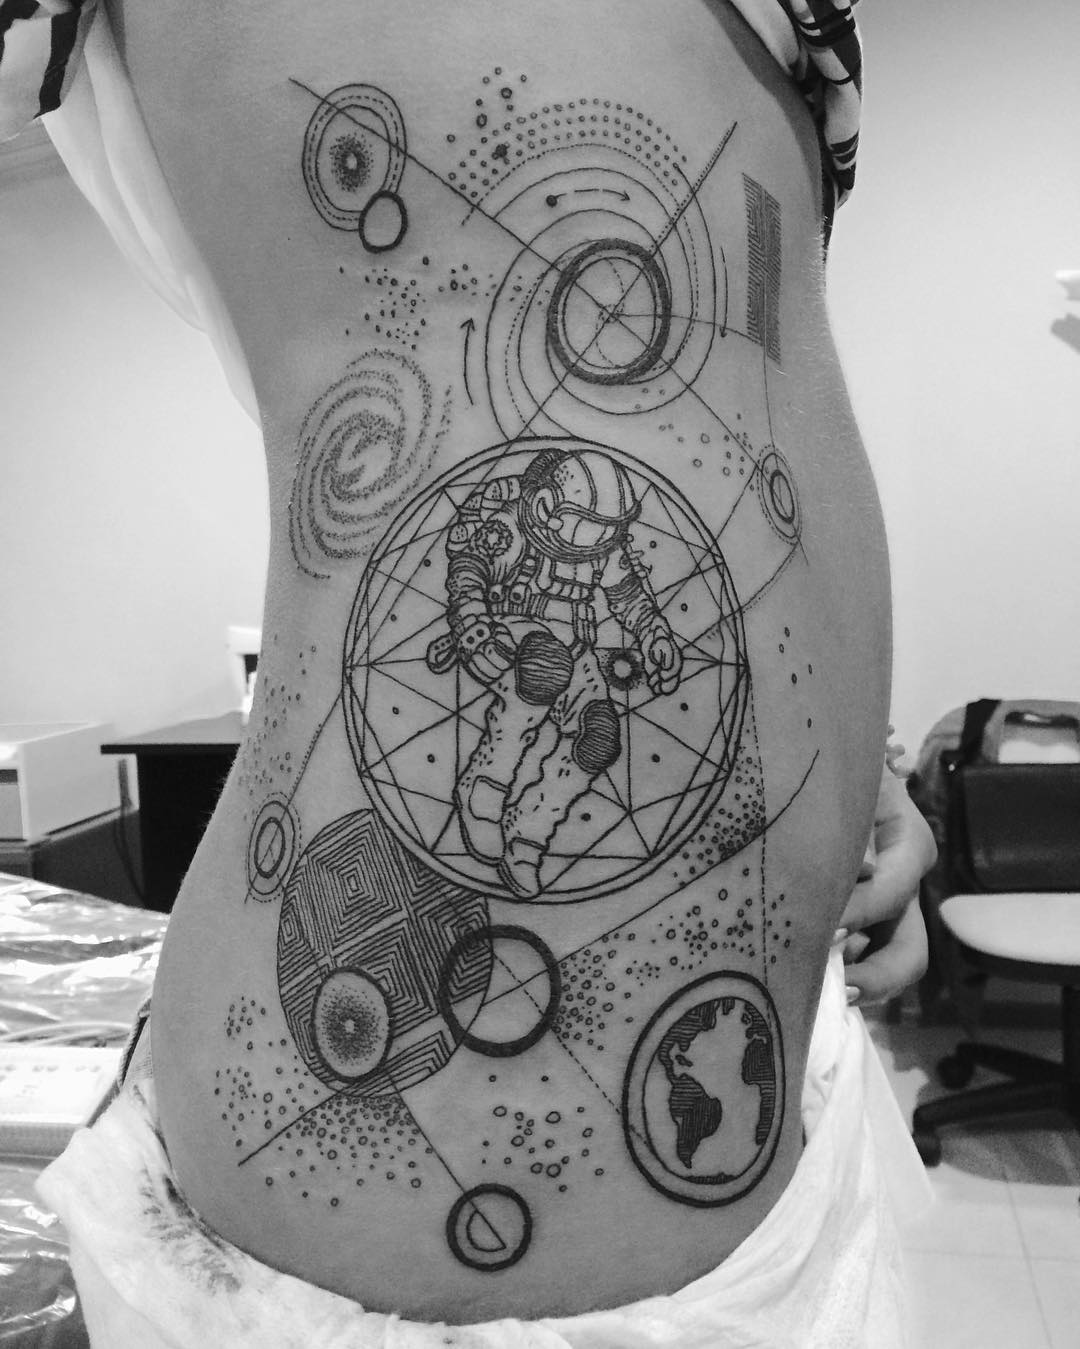 Geometric solar system tattoo on side